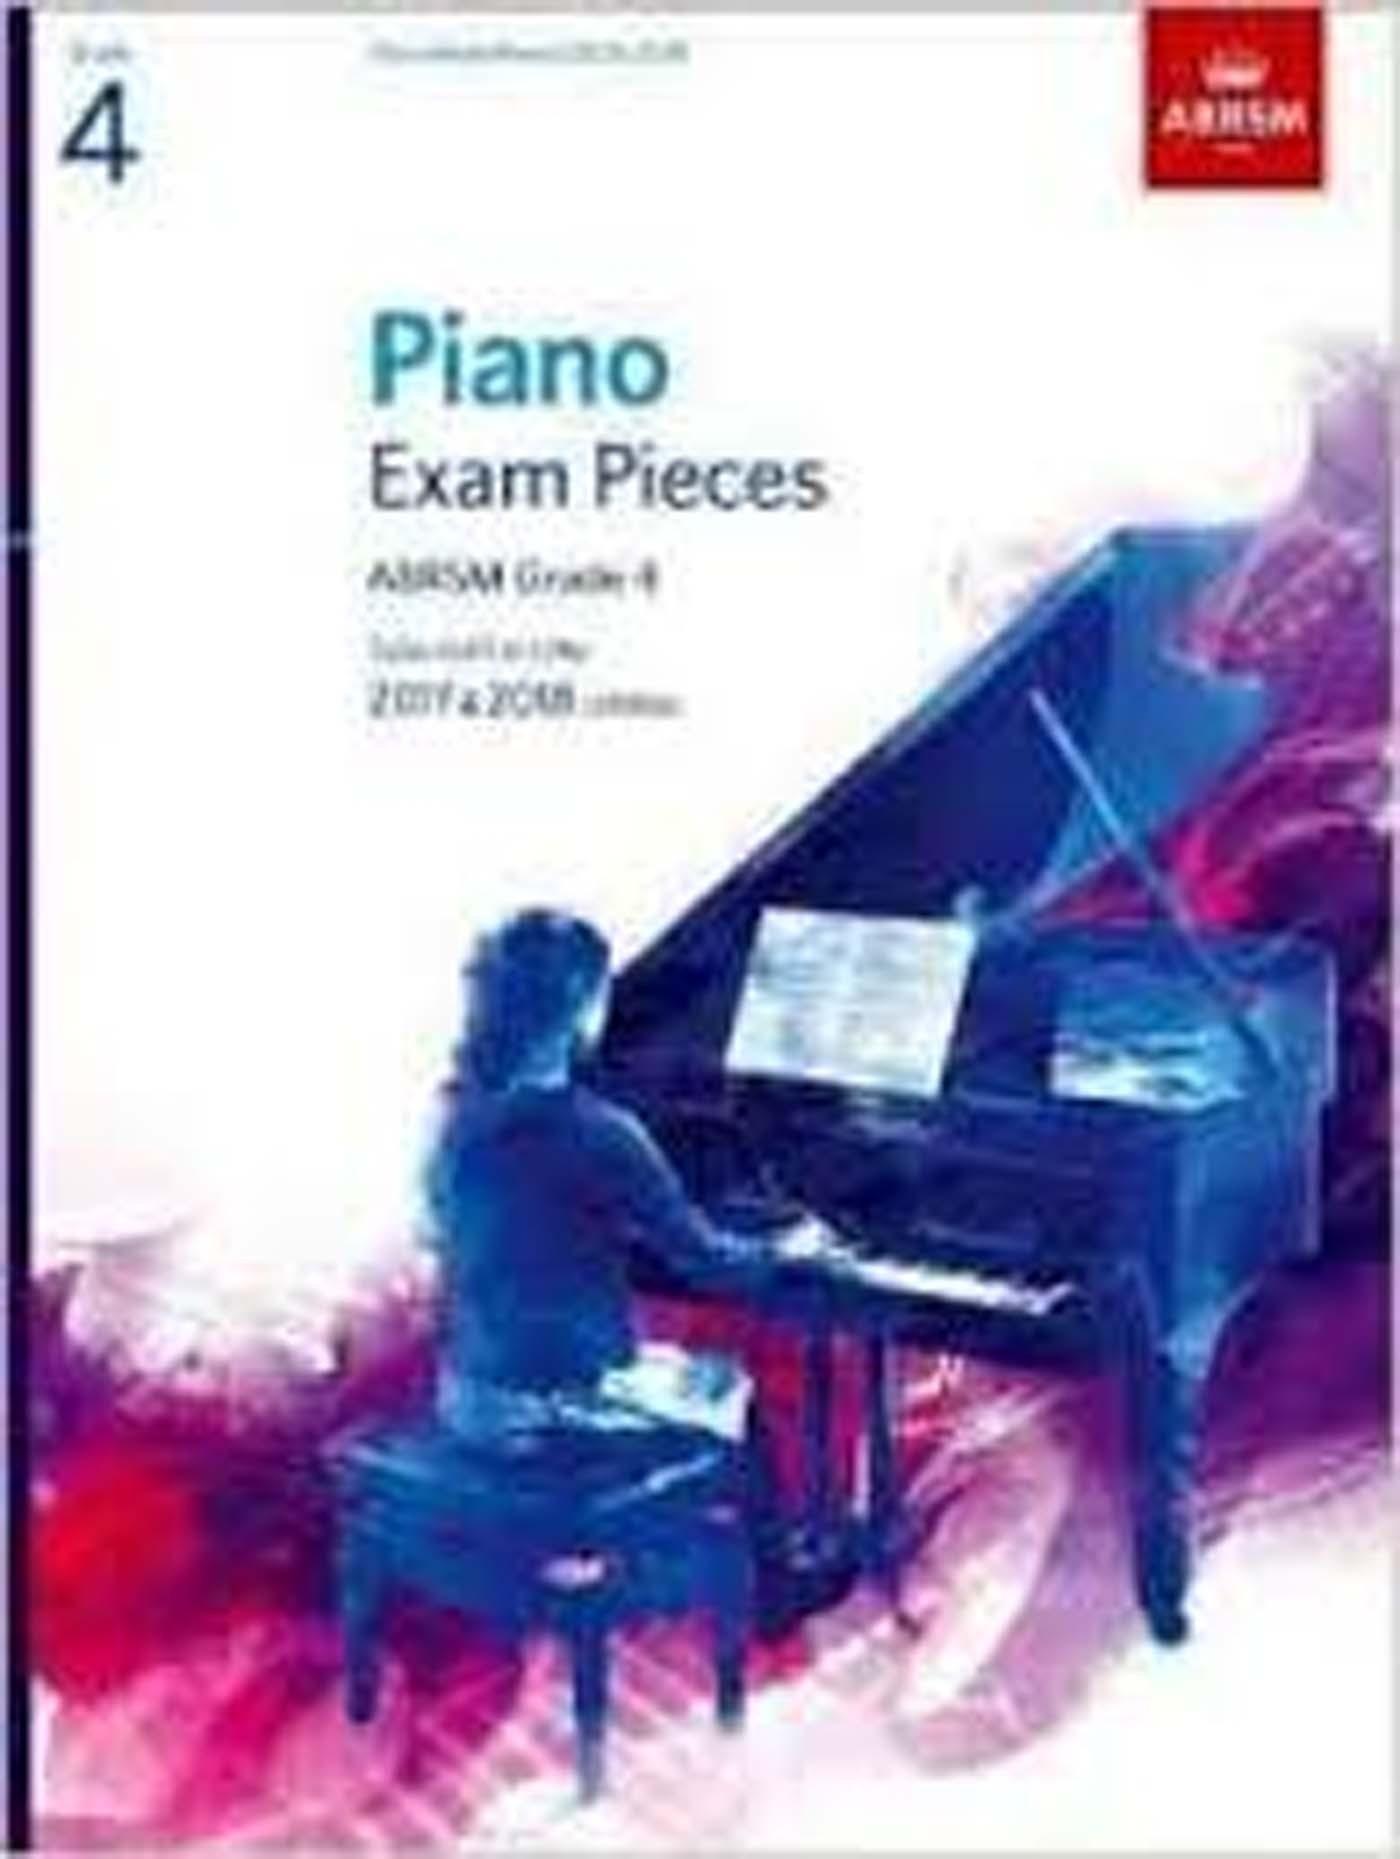 Piano Exam Pieces ABRSM Grade 4 2017 & 2018 Syllabus Exam Book S162